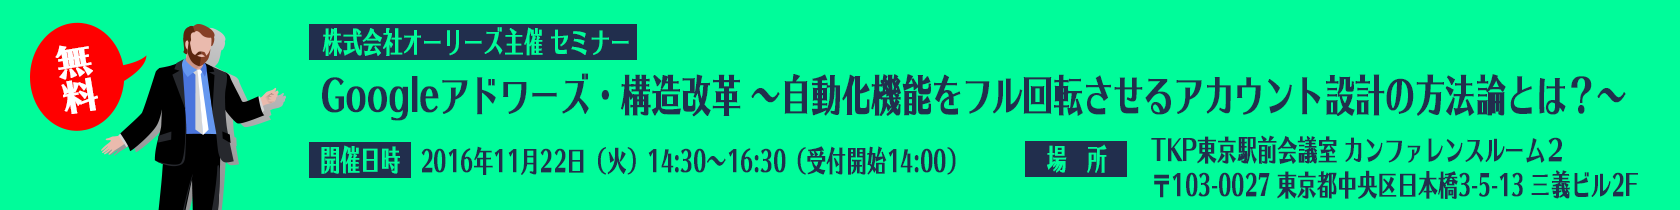 161107_banner